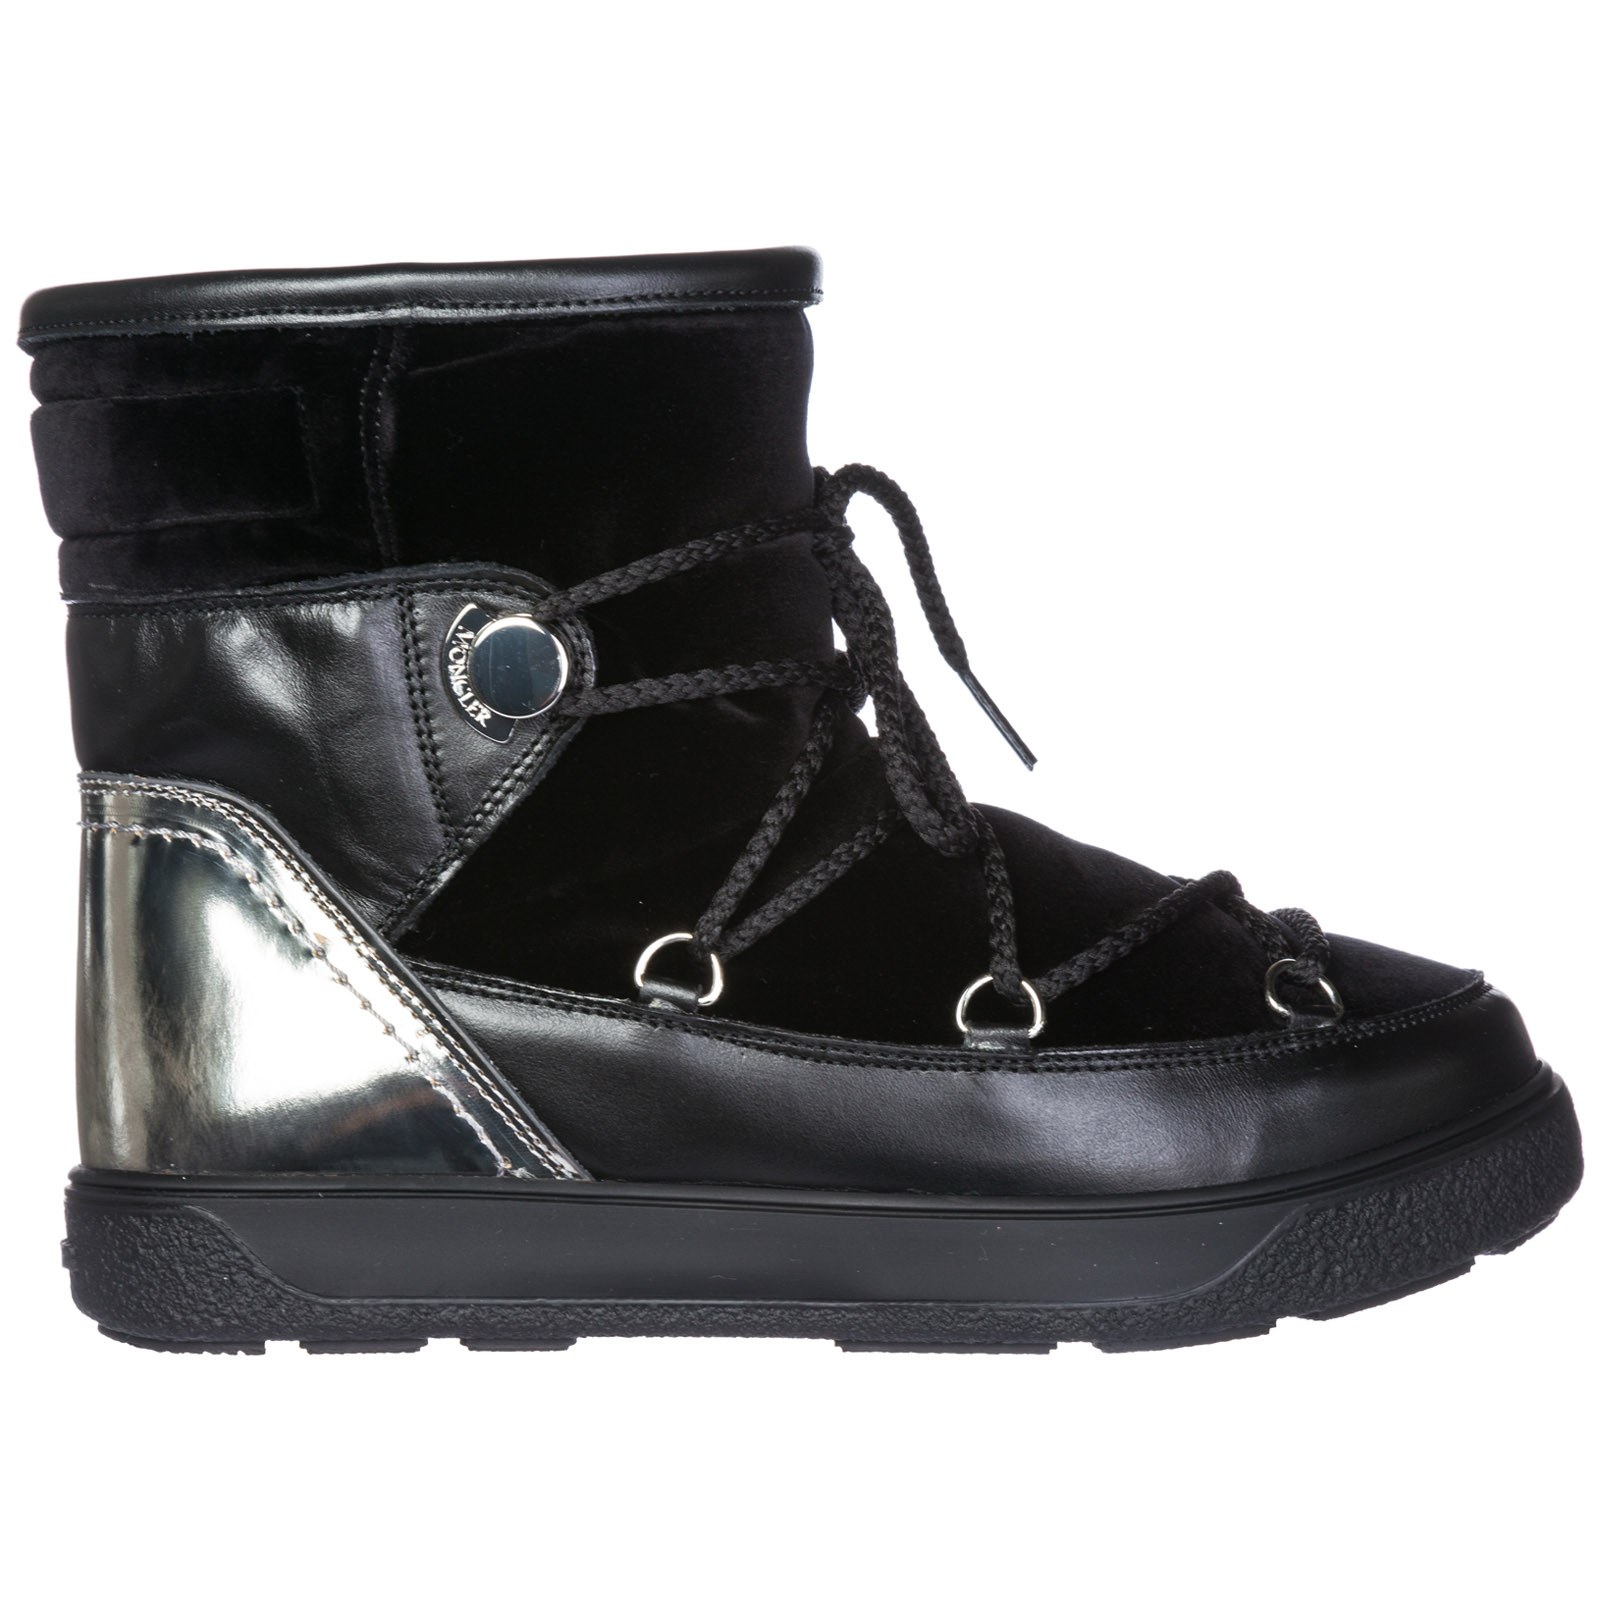 moncler womens winter boots